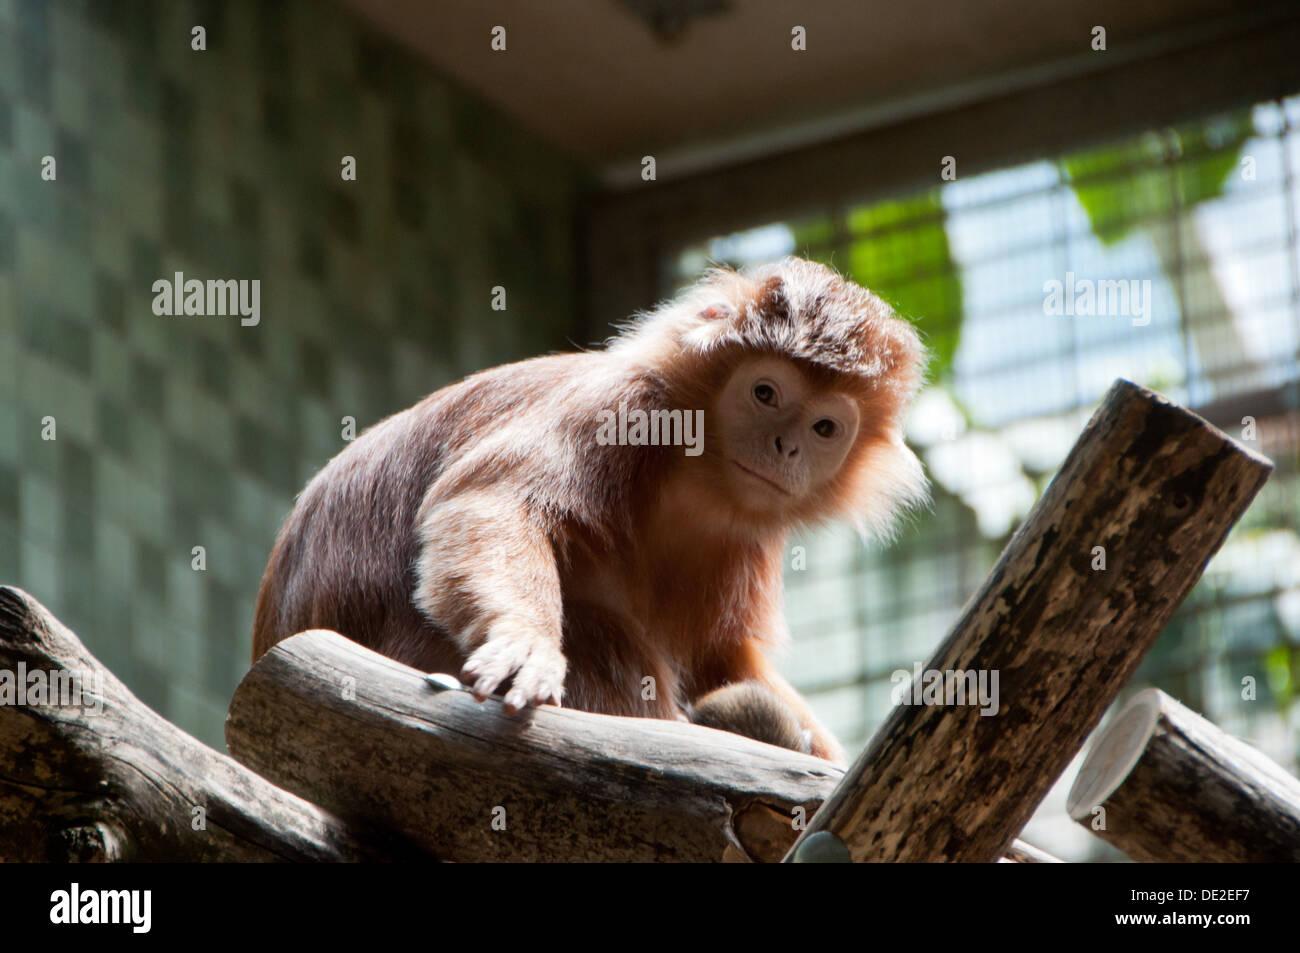 A little monkey at Berlin Zoo looking a little bit sad. Stock Photo